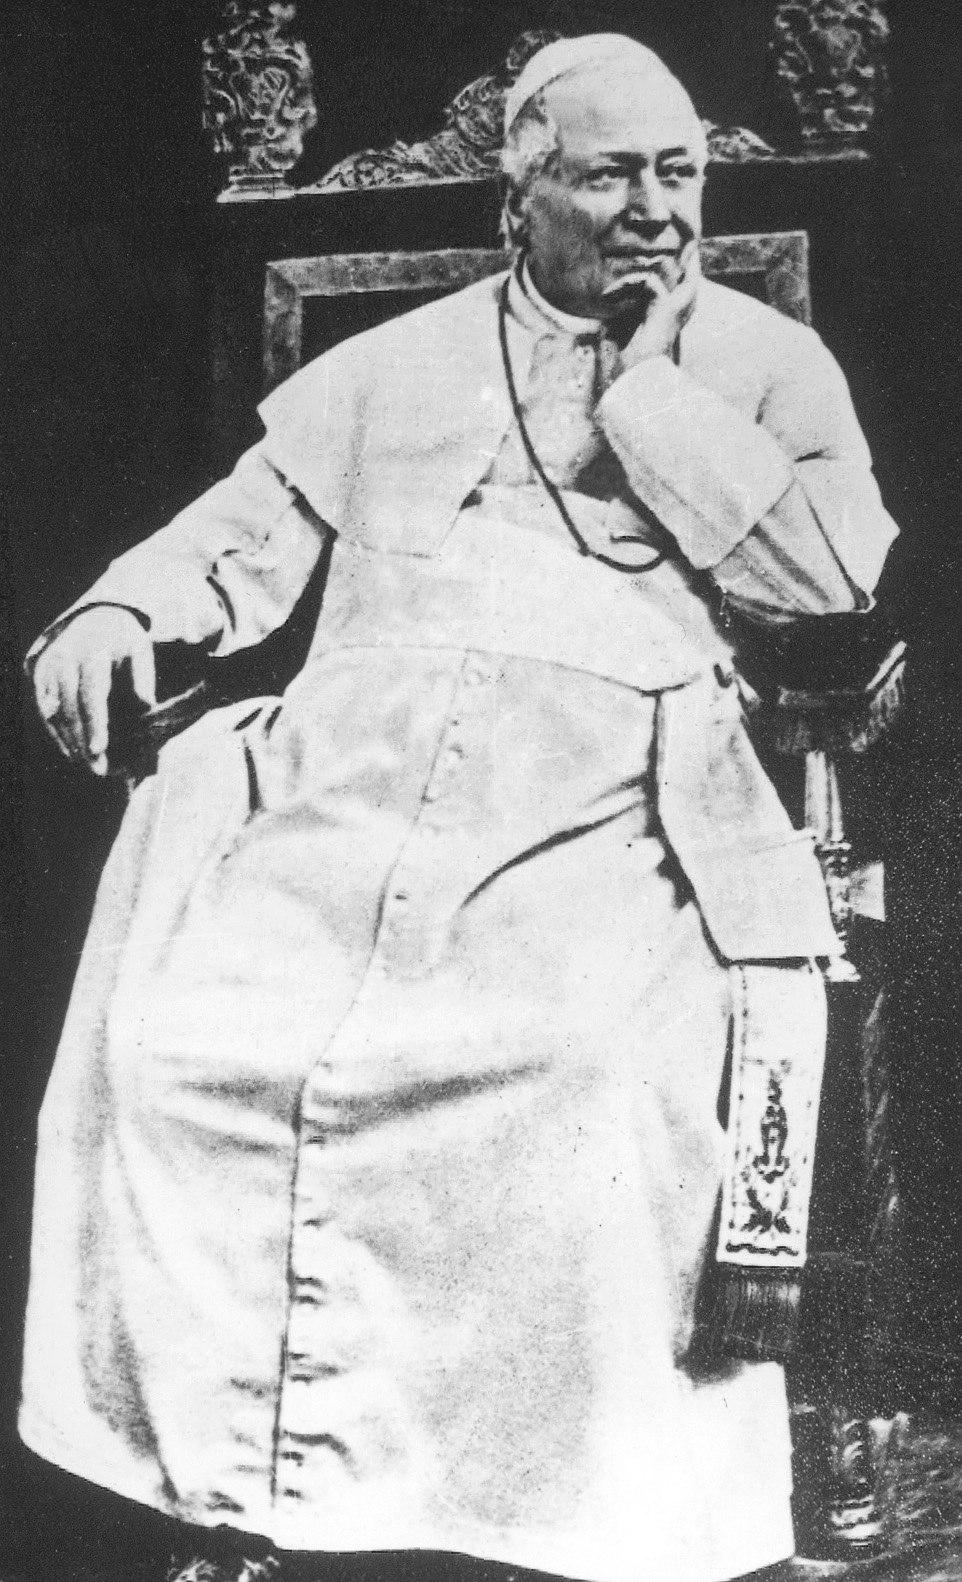 IX. Piusz p%C3%A1pa